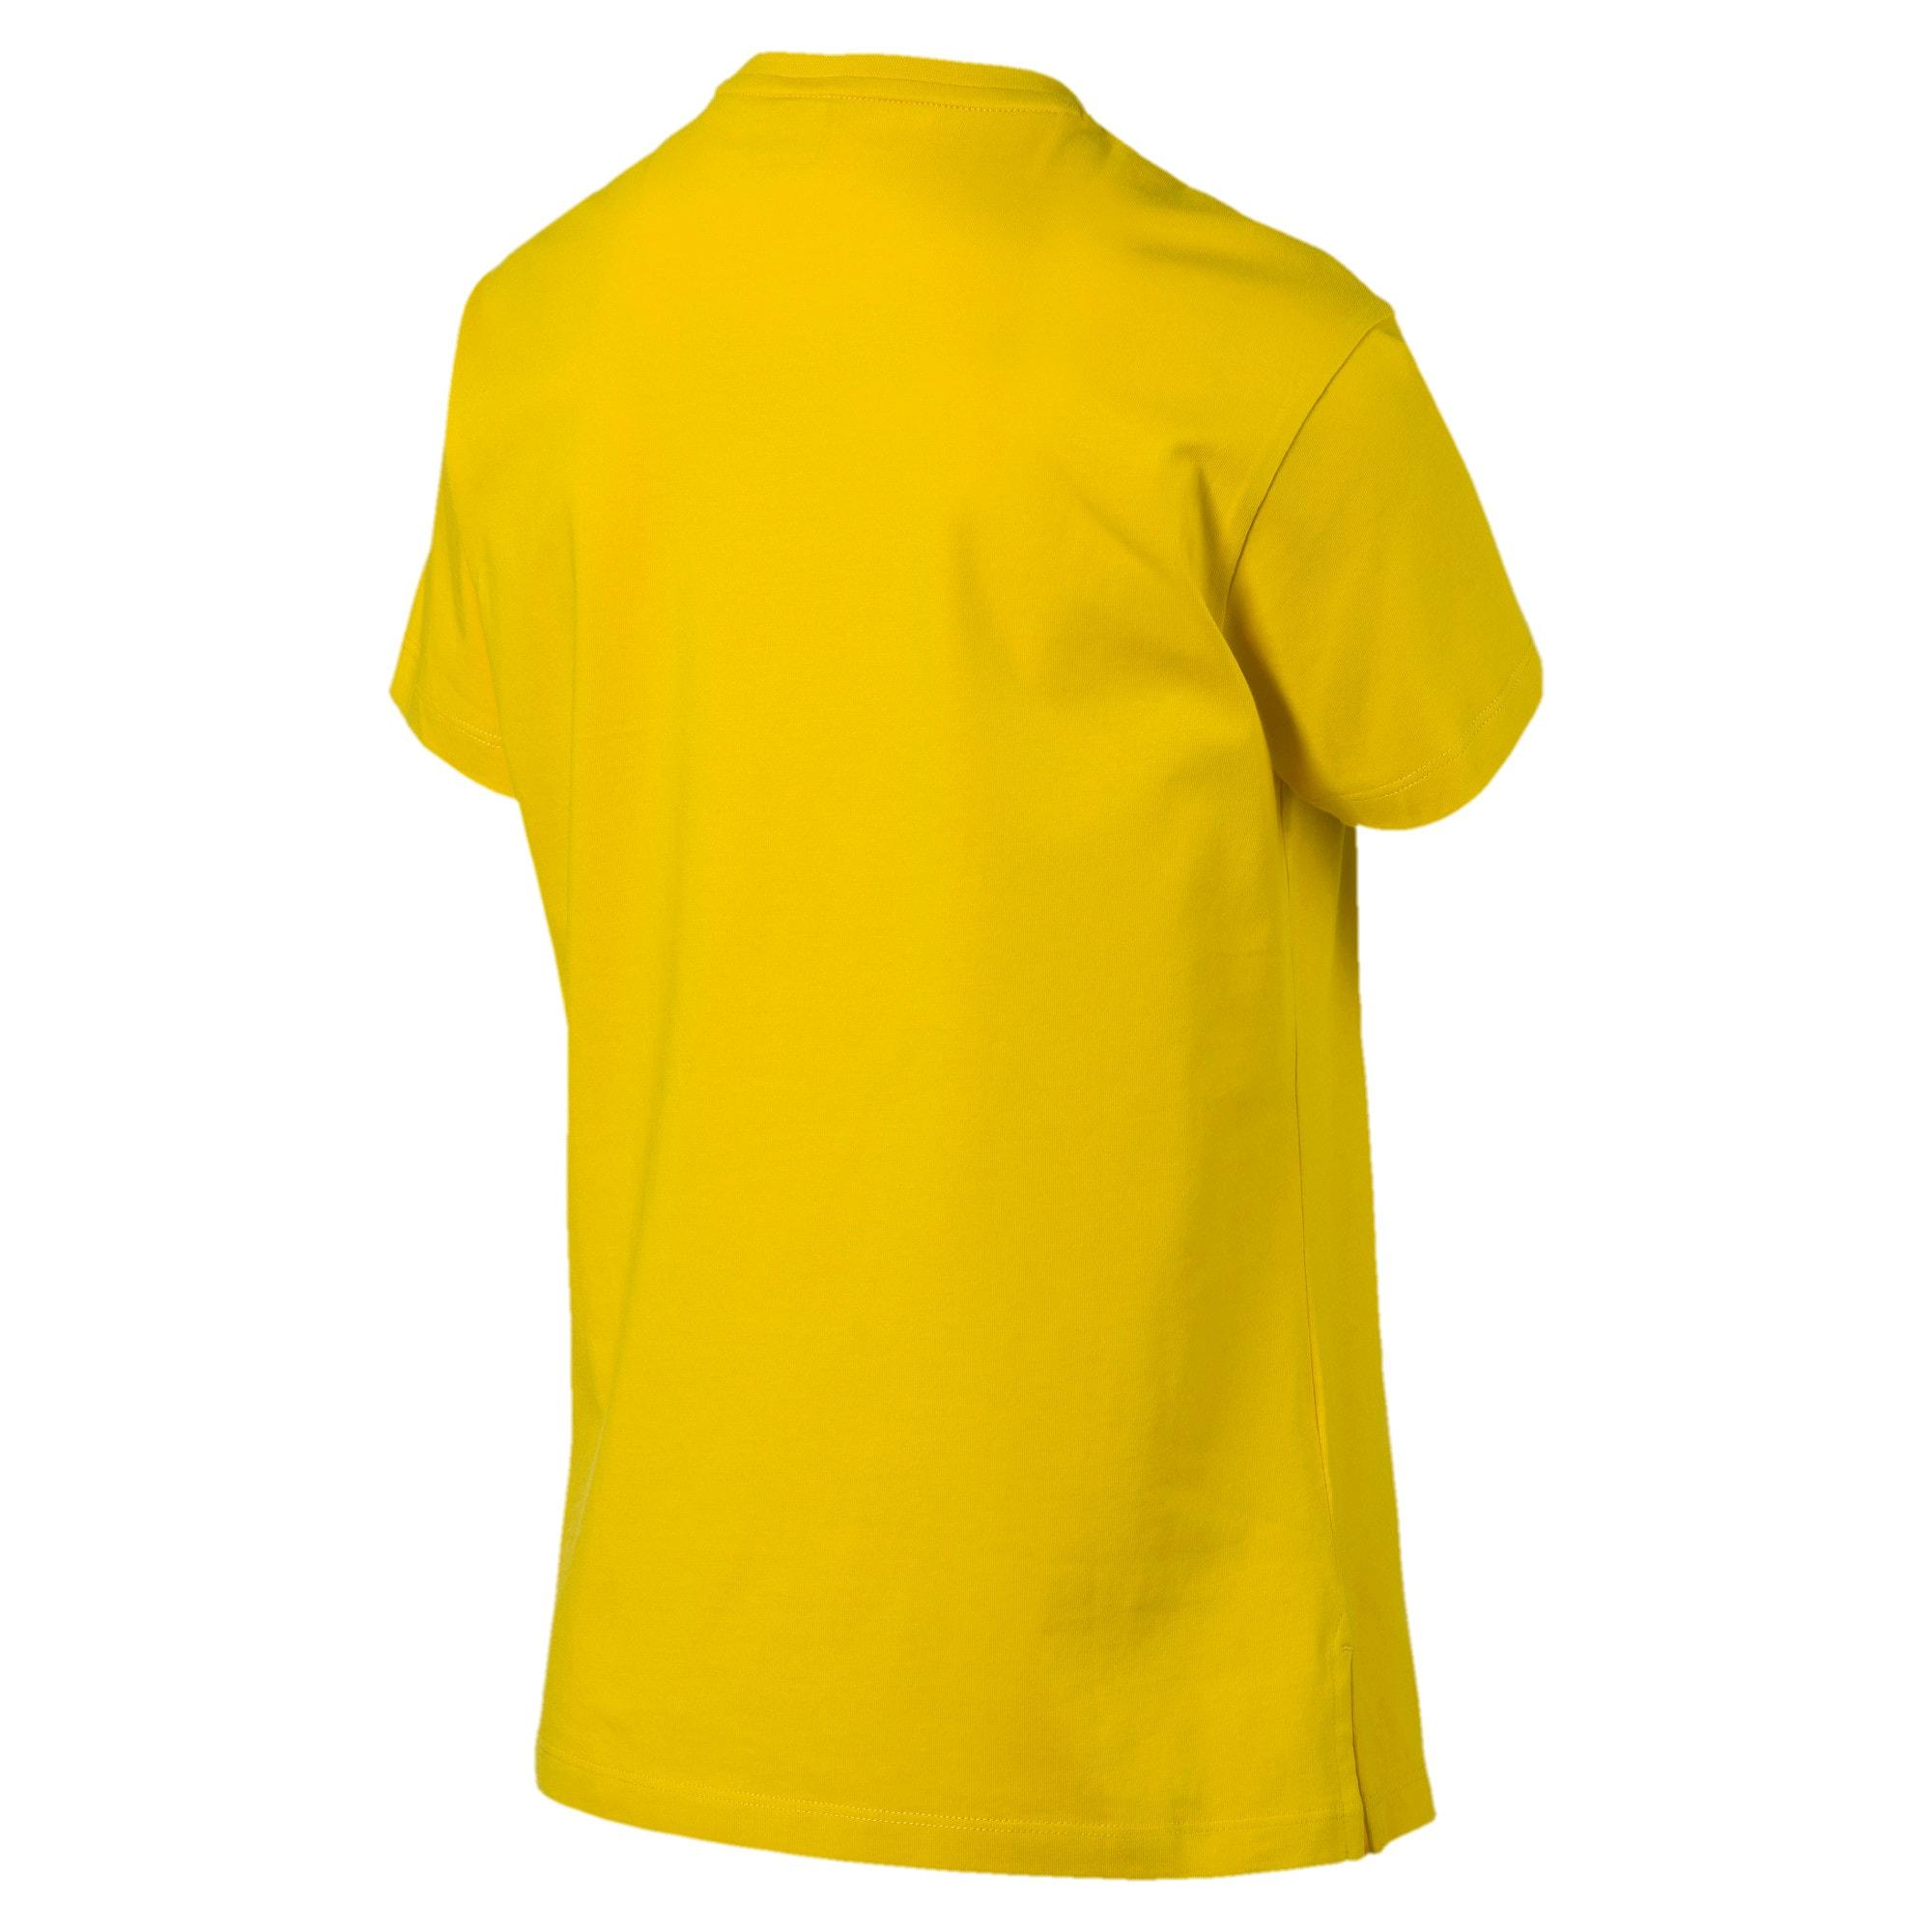 Miniatura 5 de Camiseta Classics con logotipo para mujer, Sulphur, mediano